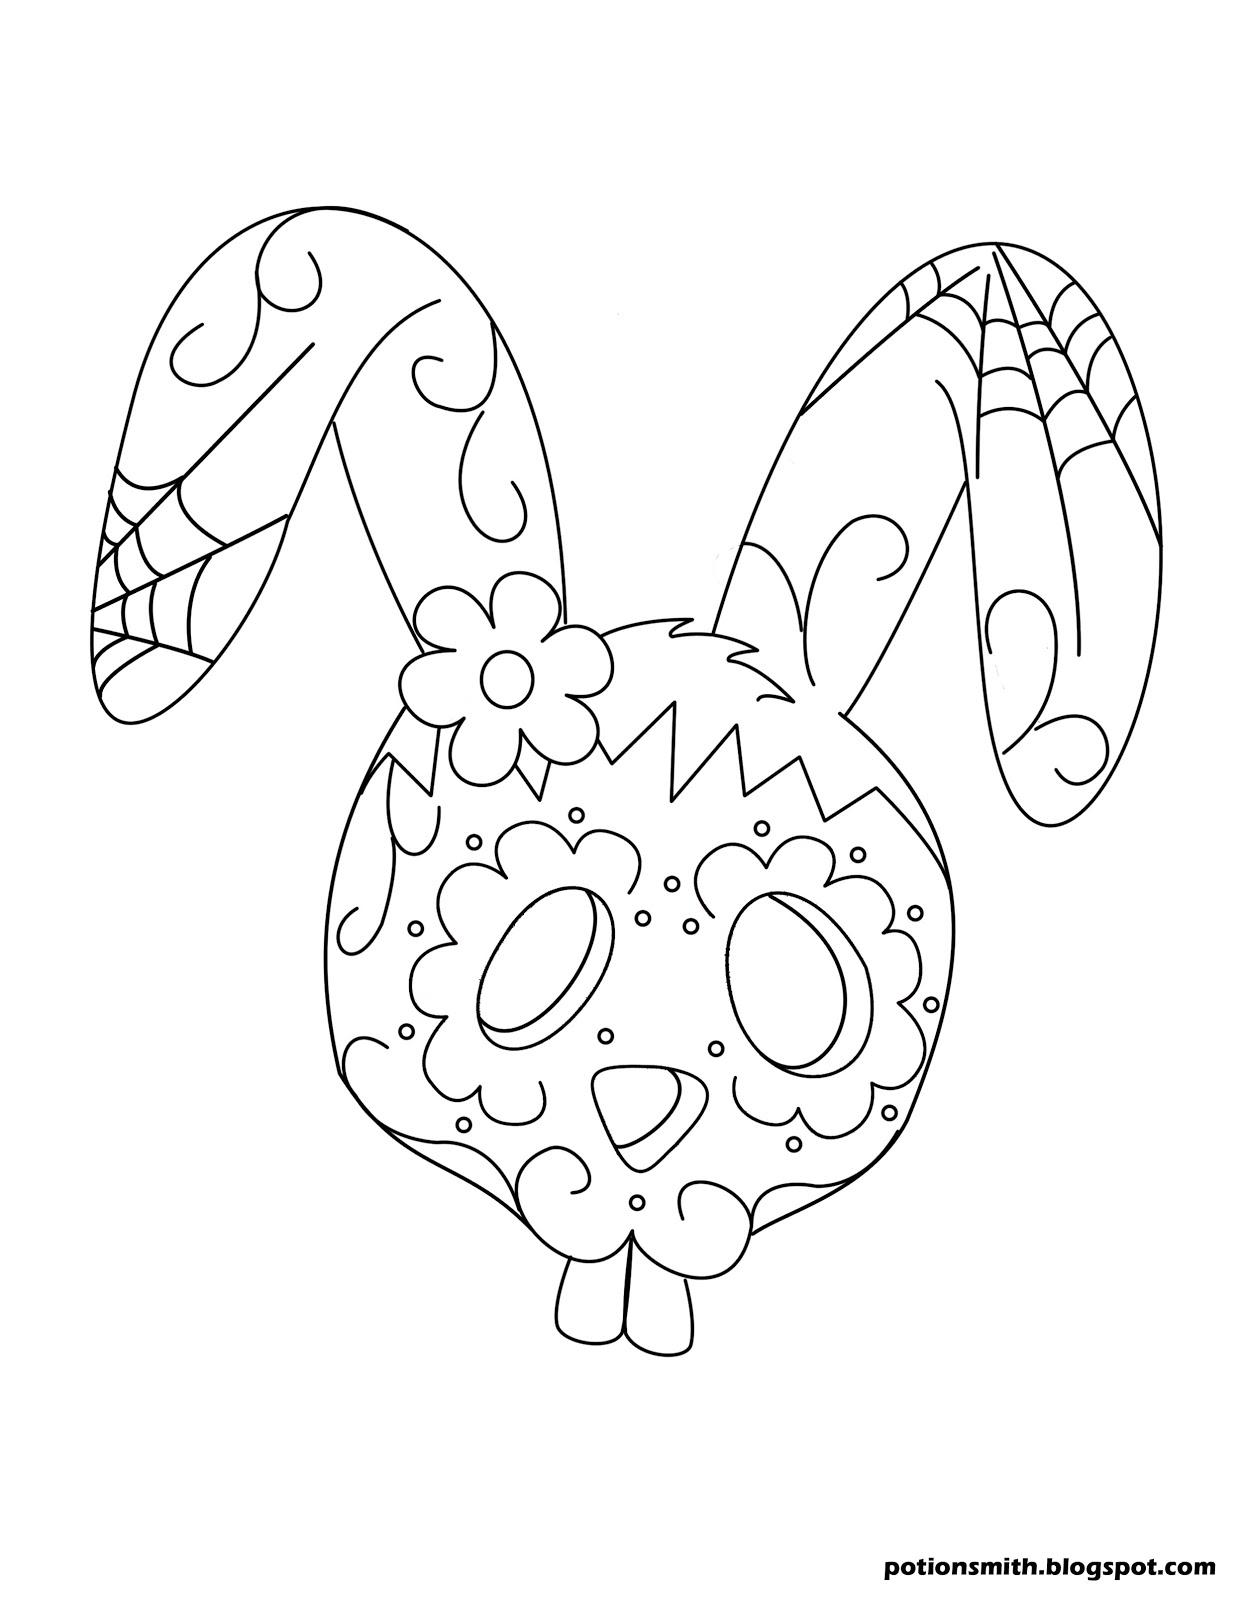 candy skull coloring pages - potionsmith sugar skull bunnies